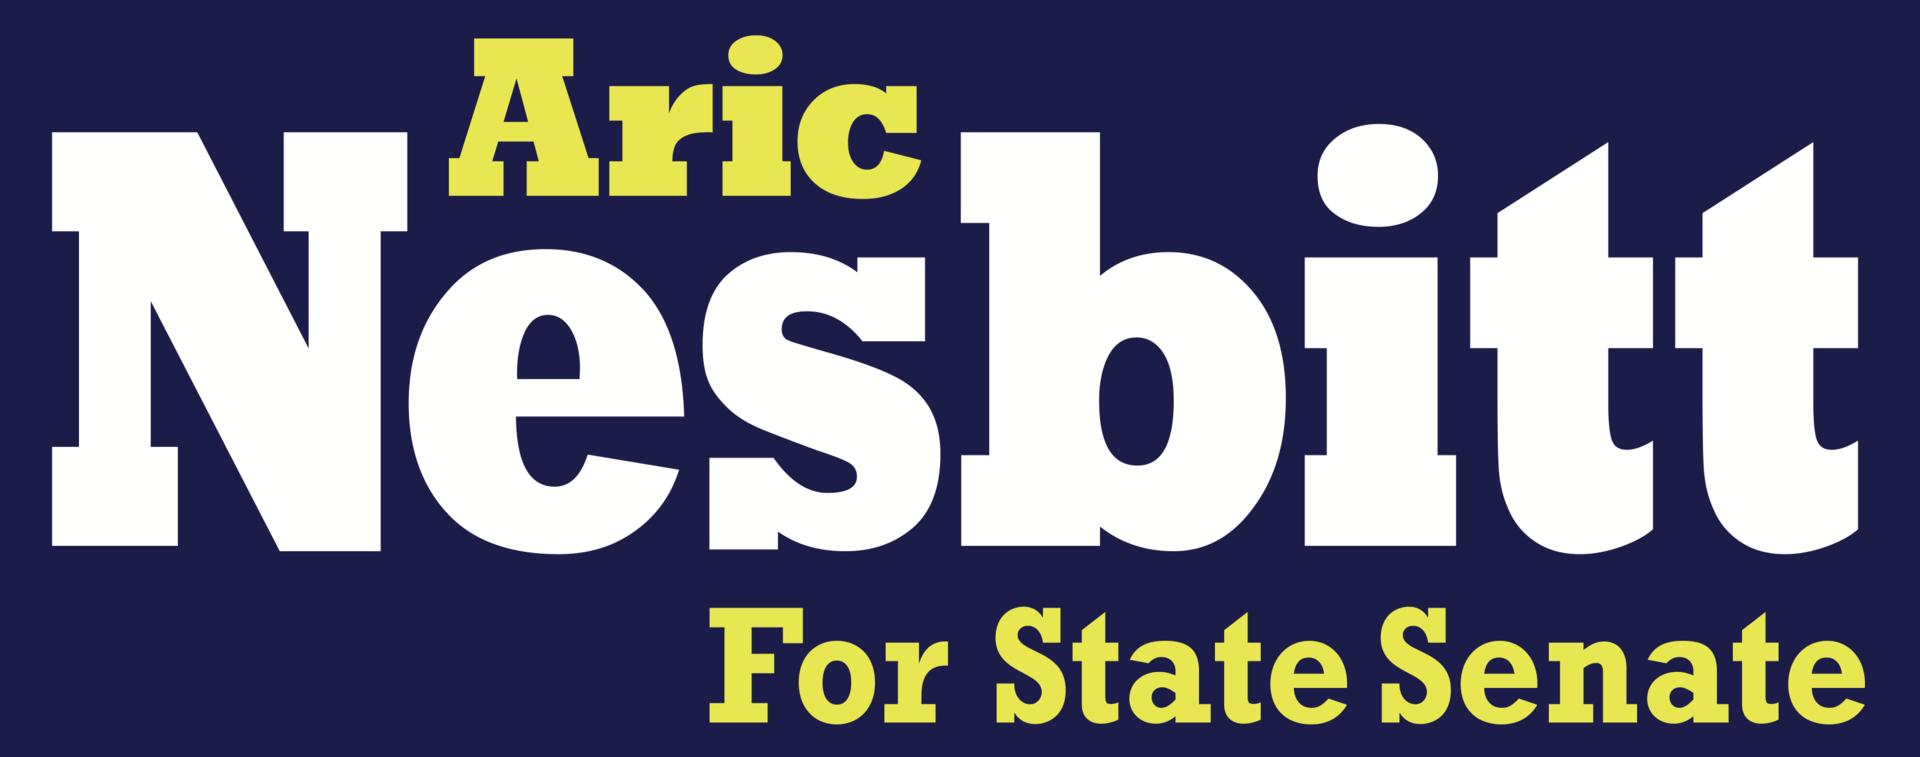 Senate logo 1